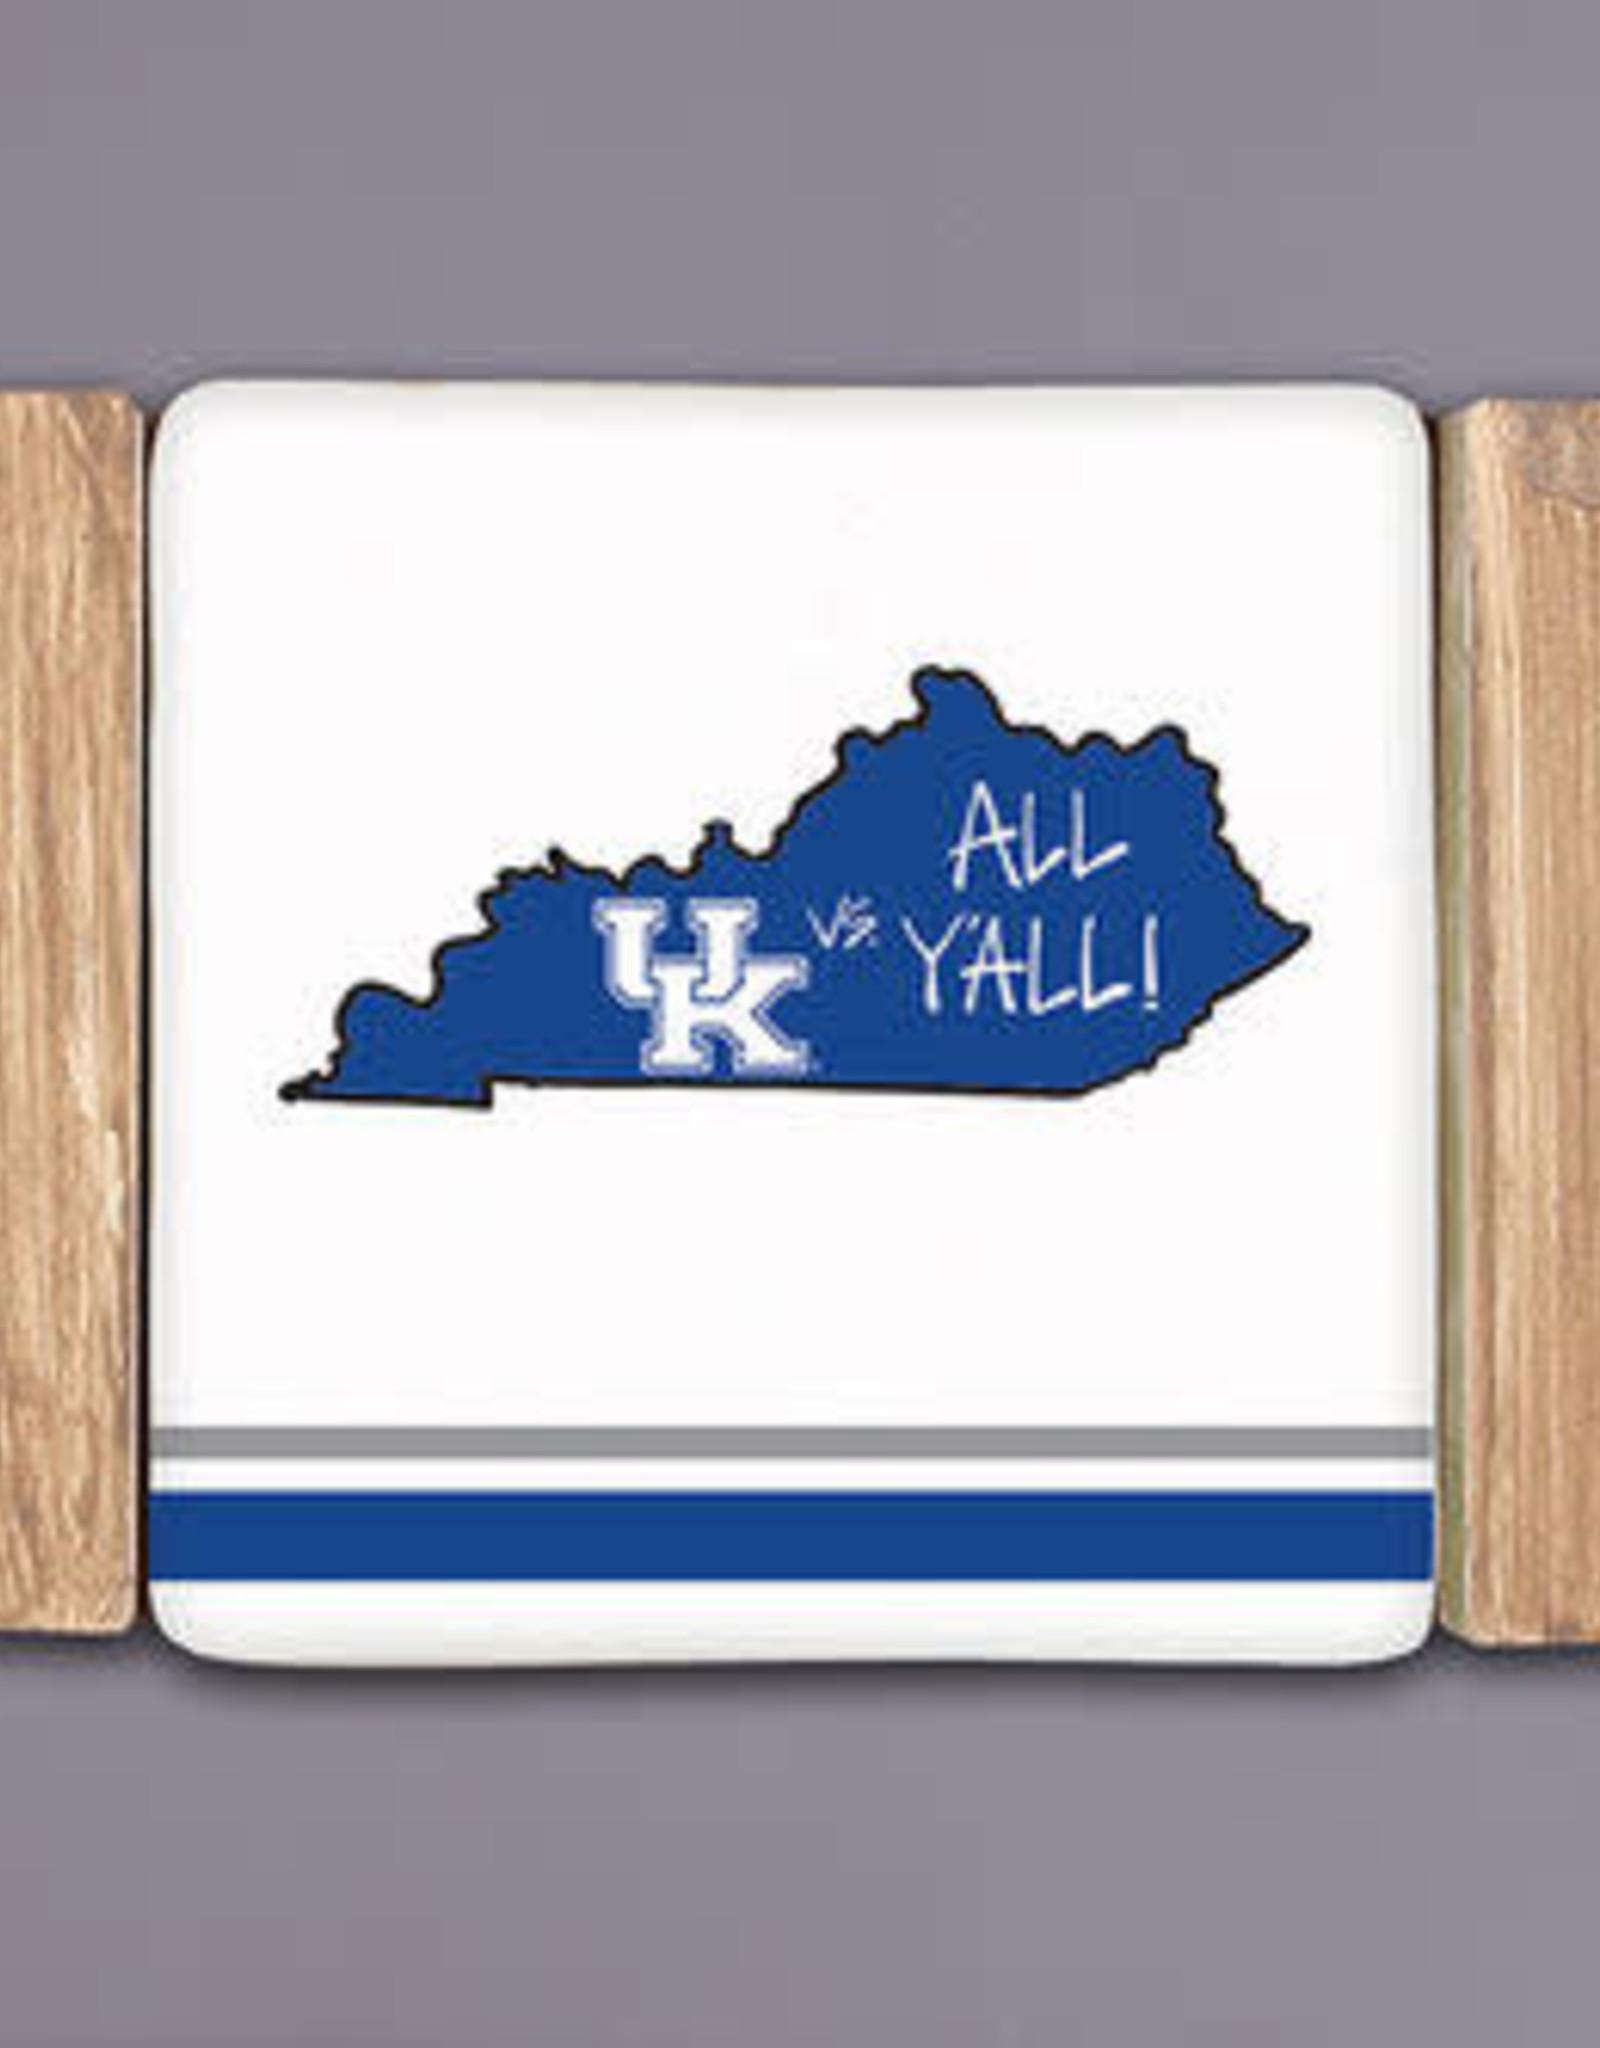 Kentucky Wildcats Striped Coasters - Set of 4